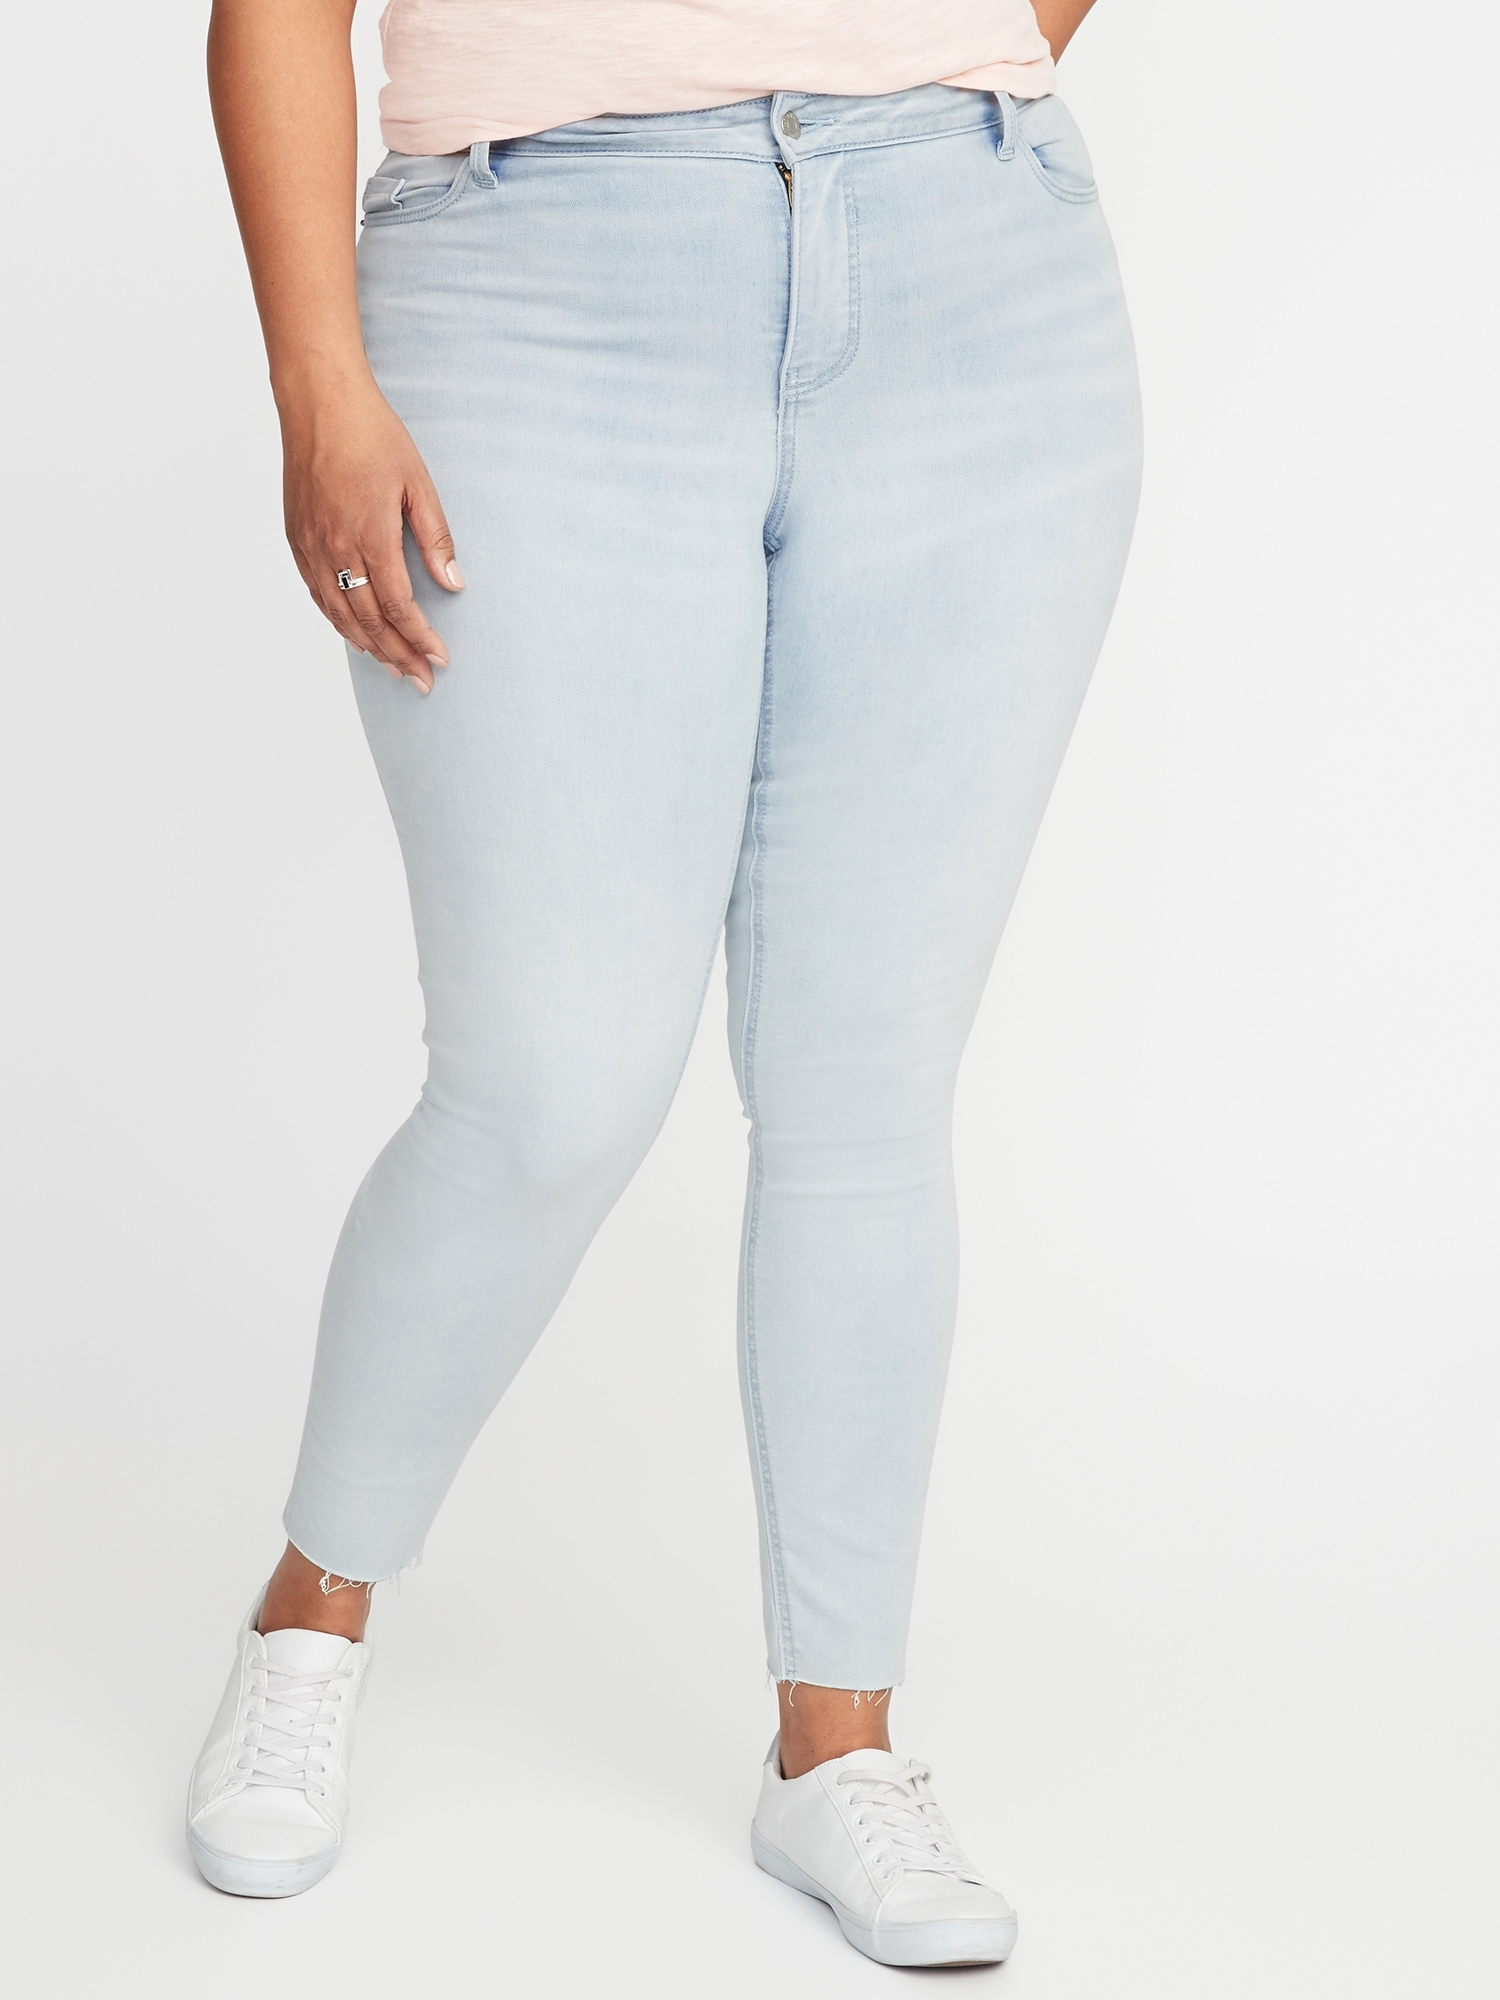 e0ac1b8aed5 High-Rise Secret-Slim Pockets Plus-Size Rockstar Jeans